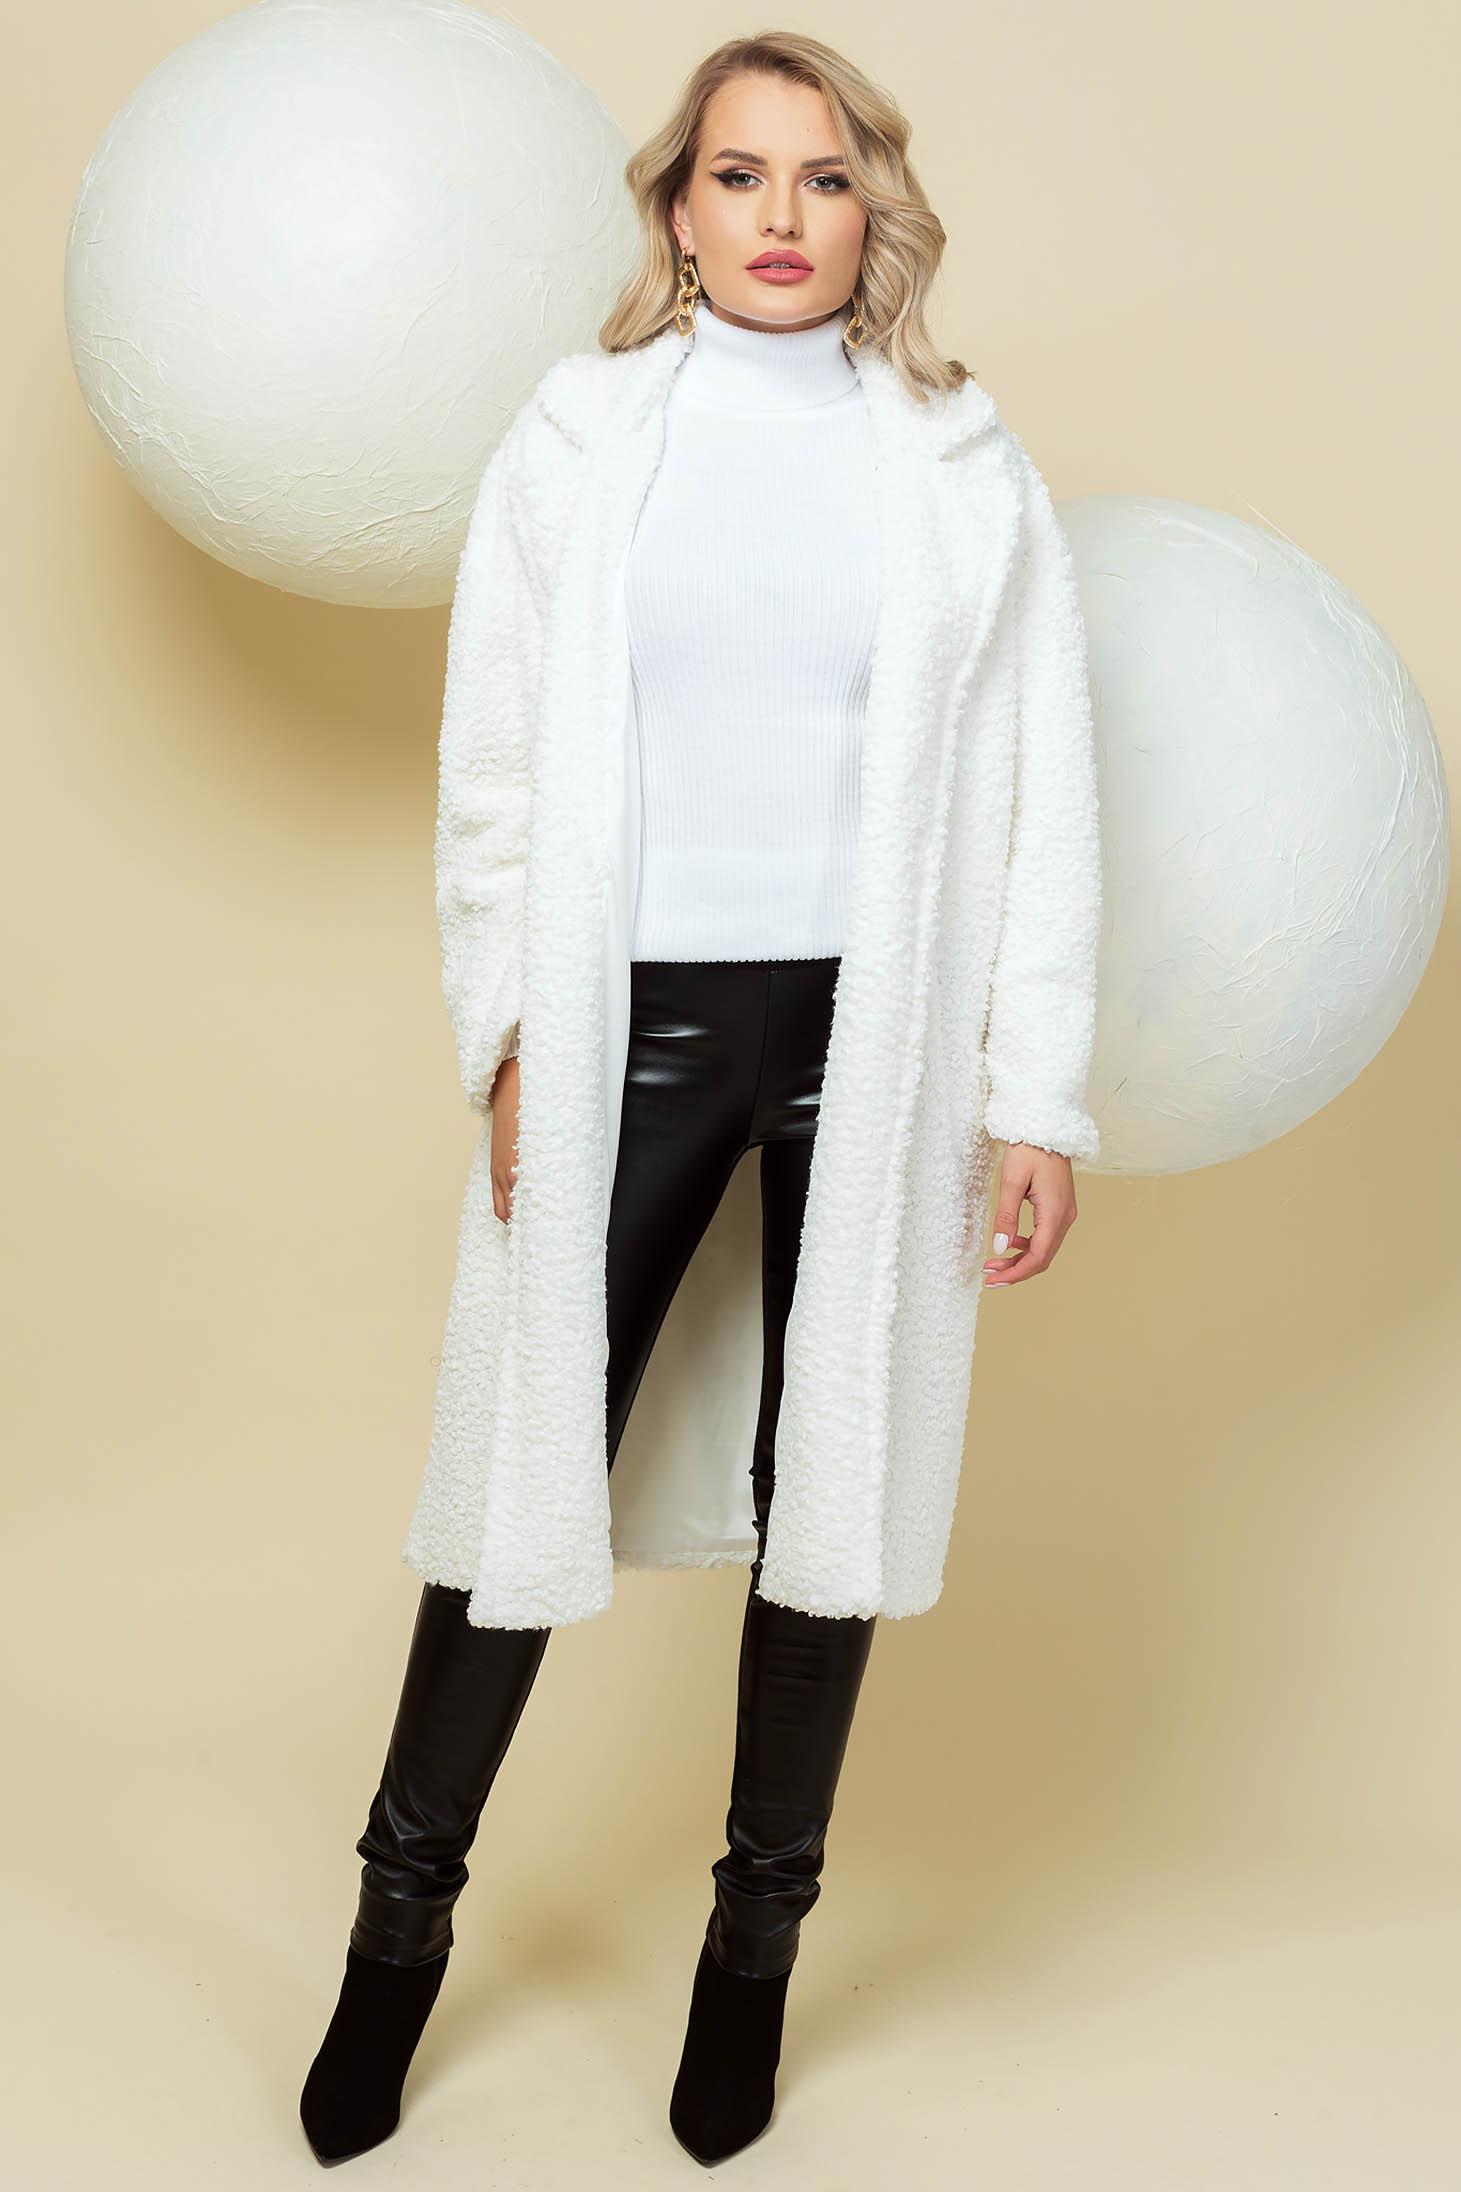 Palton PrettyGirl alb lung din material pufos tip blanita cu croi larg